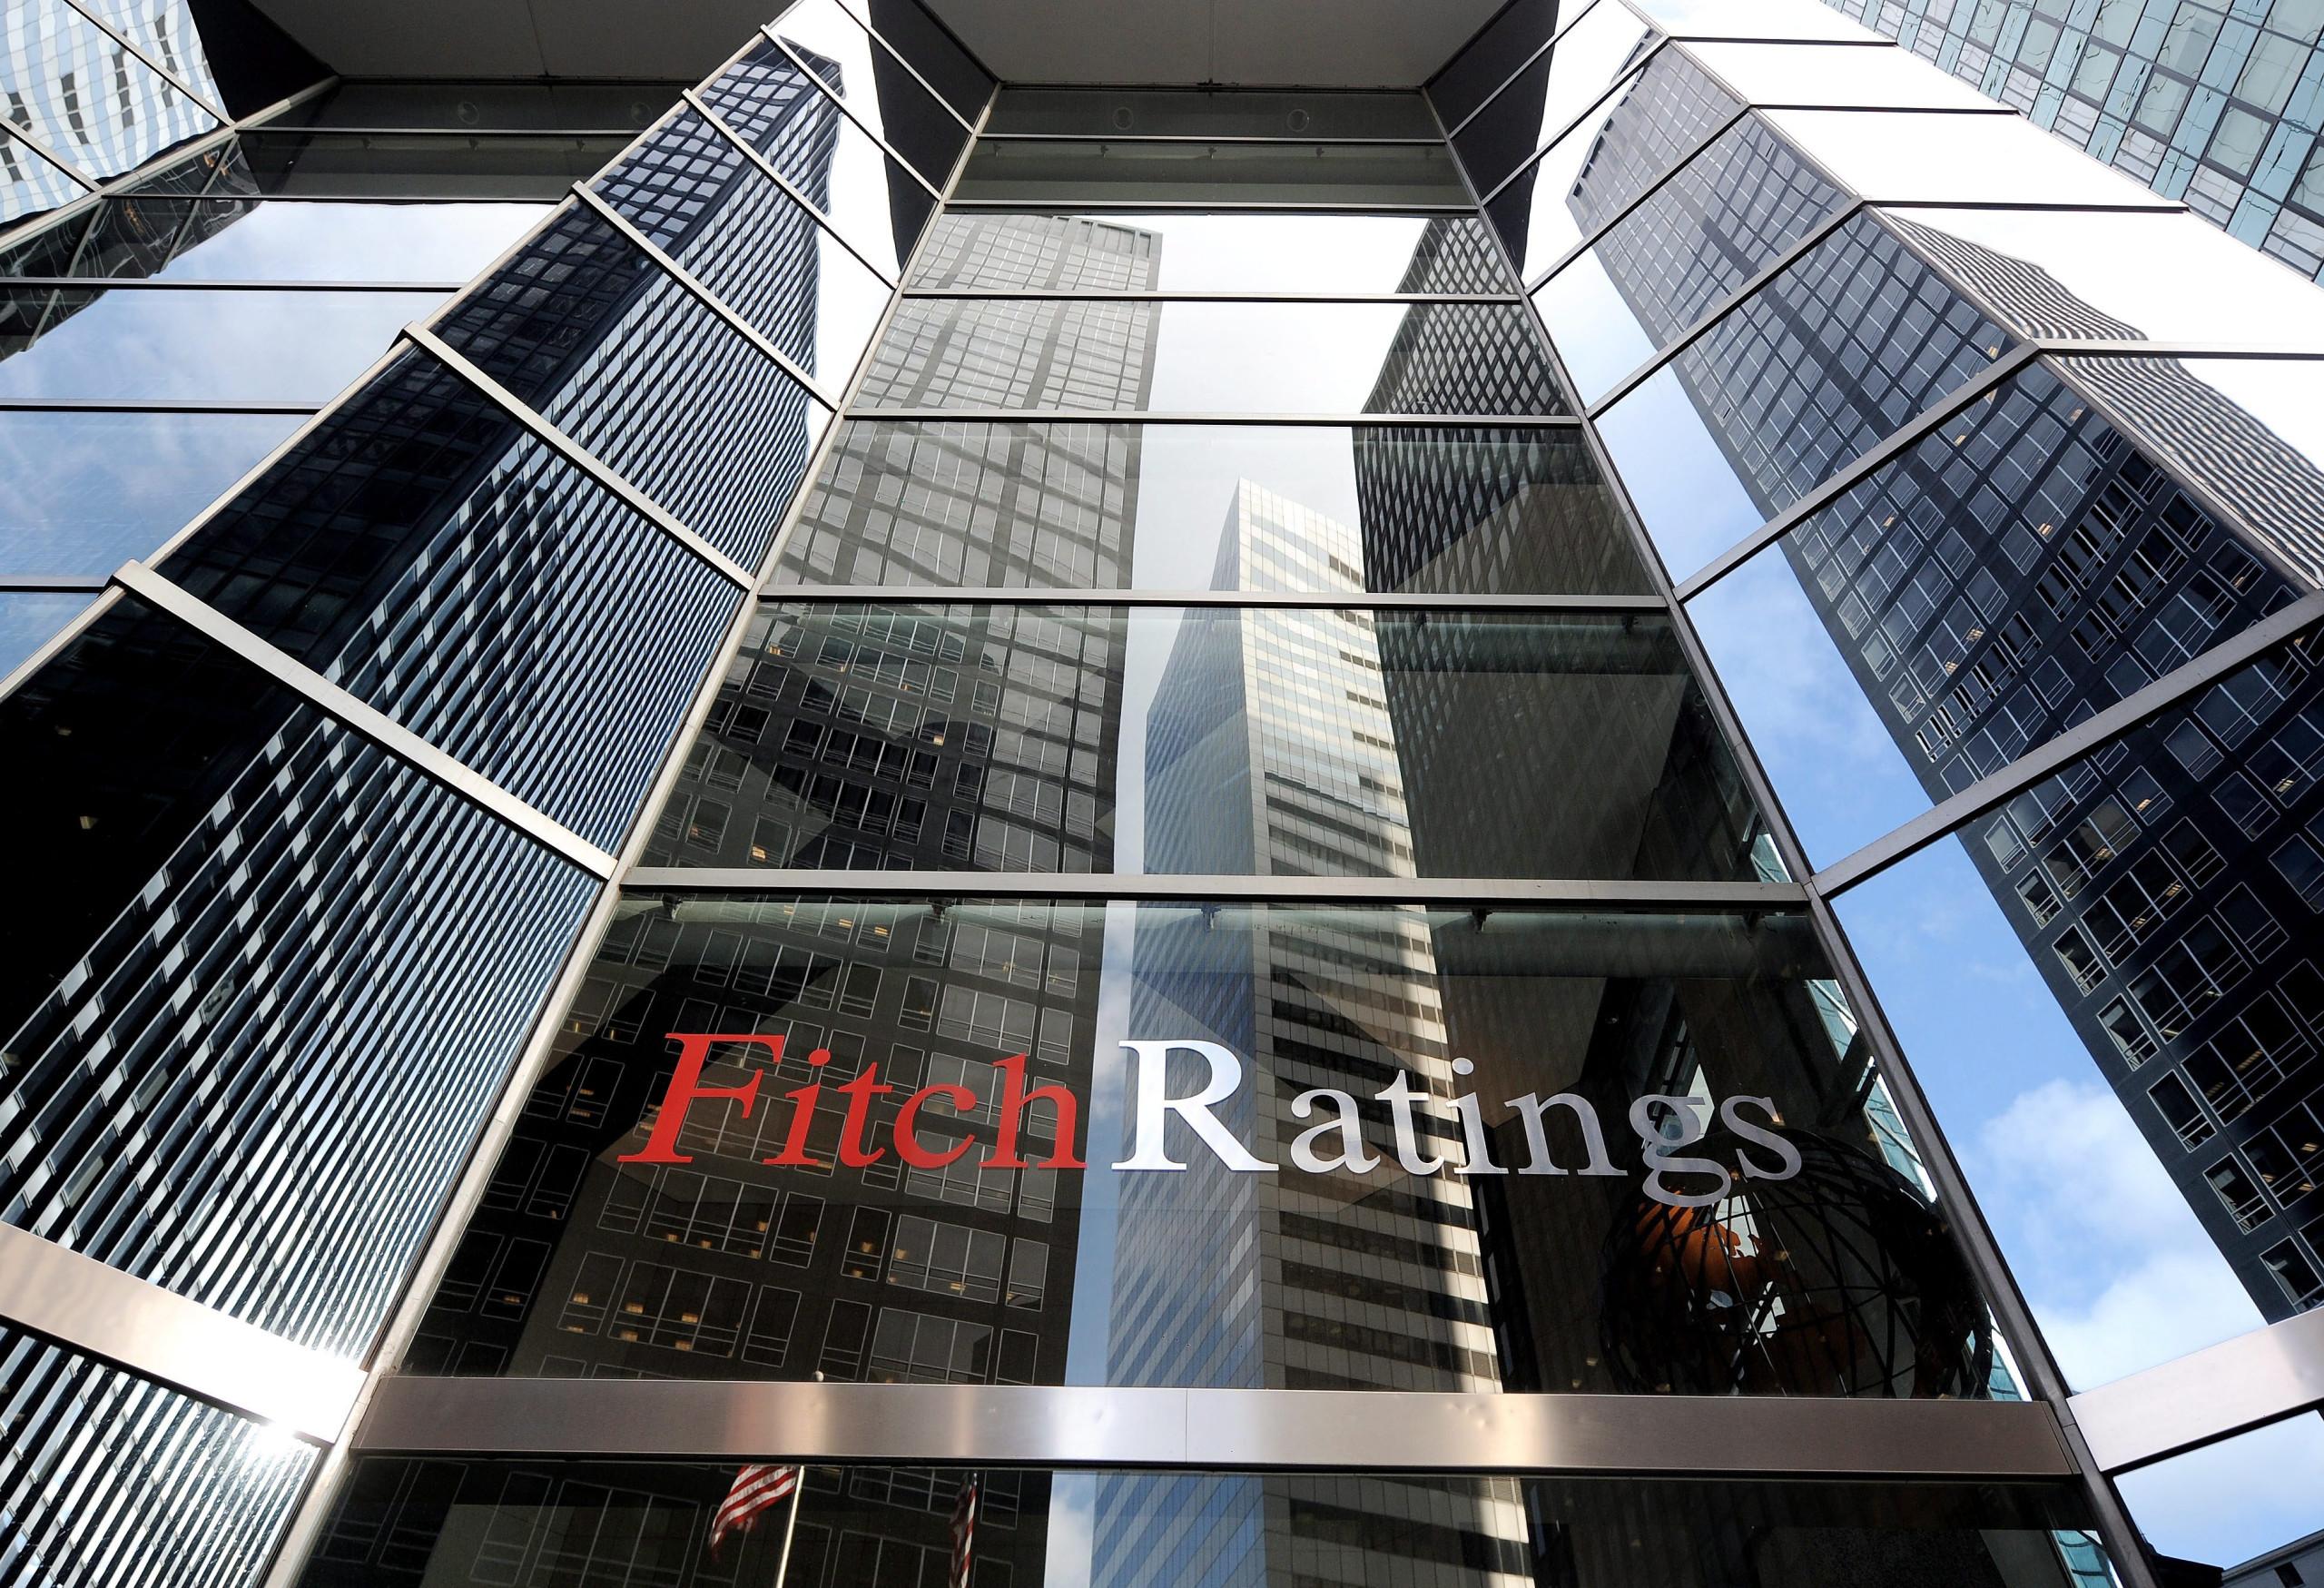 Rácio de crédito malparado na banca desceu de 15% para 11%, diz Fitch